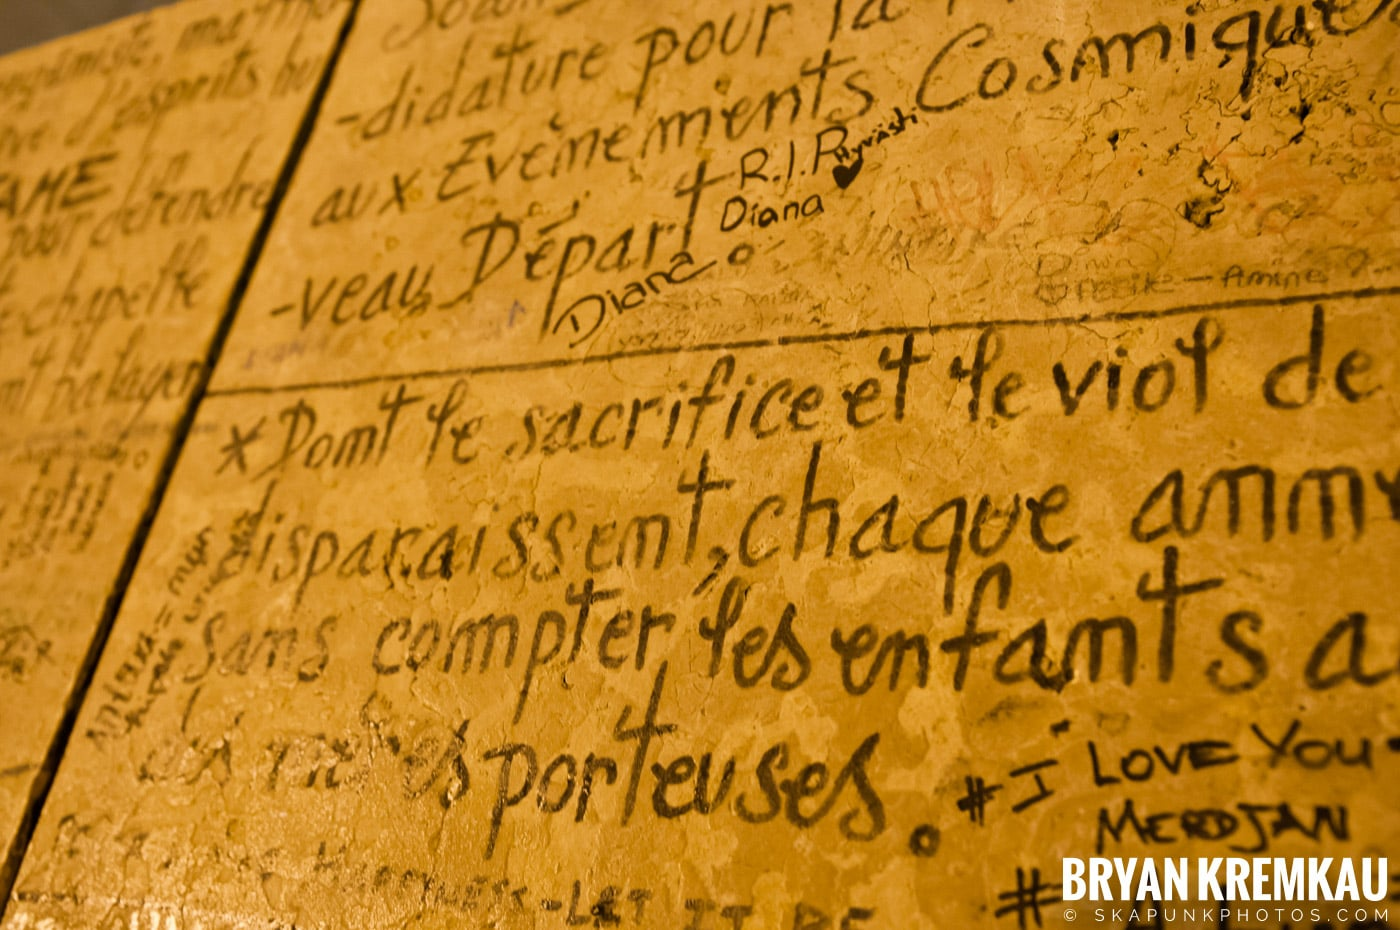 Paris, France Honeymoon - Day 5 - 7.22.11 (3)